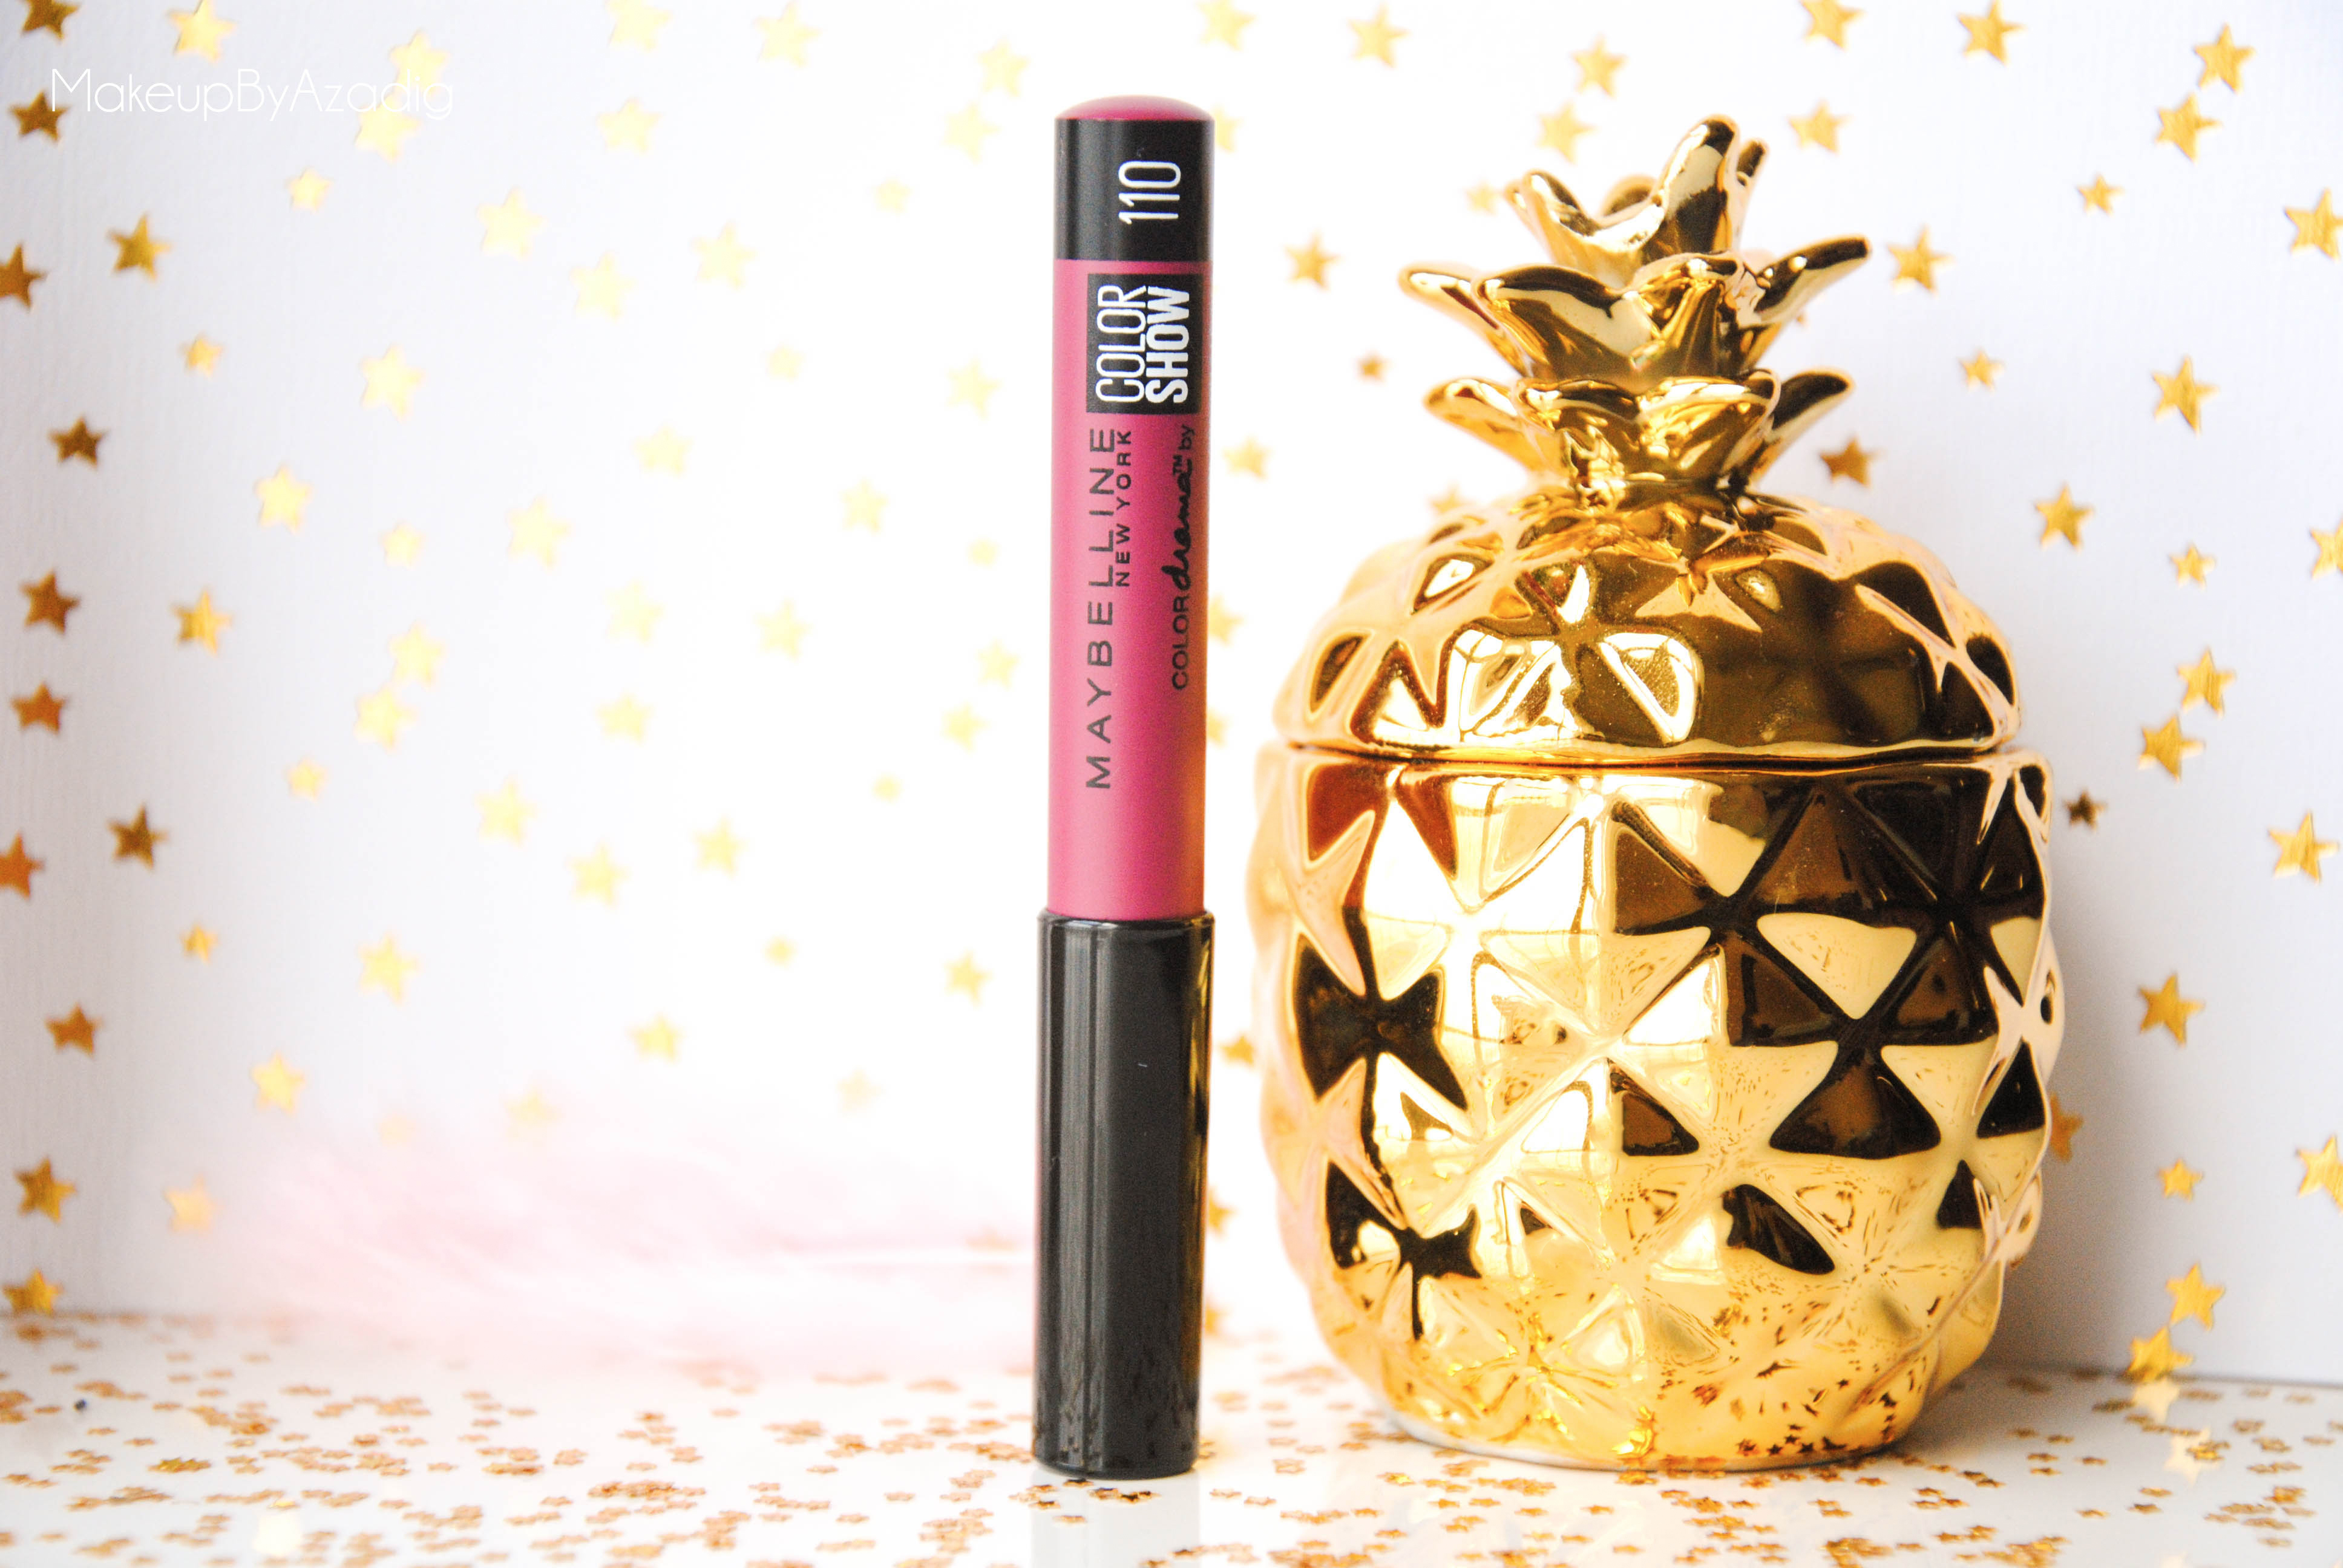 crayon-levres - colorshow - colordrama - gemey maybelline - teinte 110 - makeupbyazadig - prune -  produit